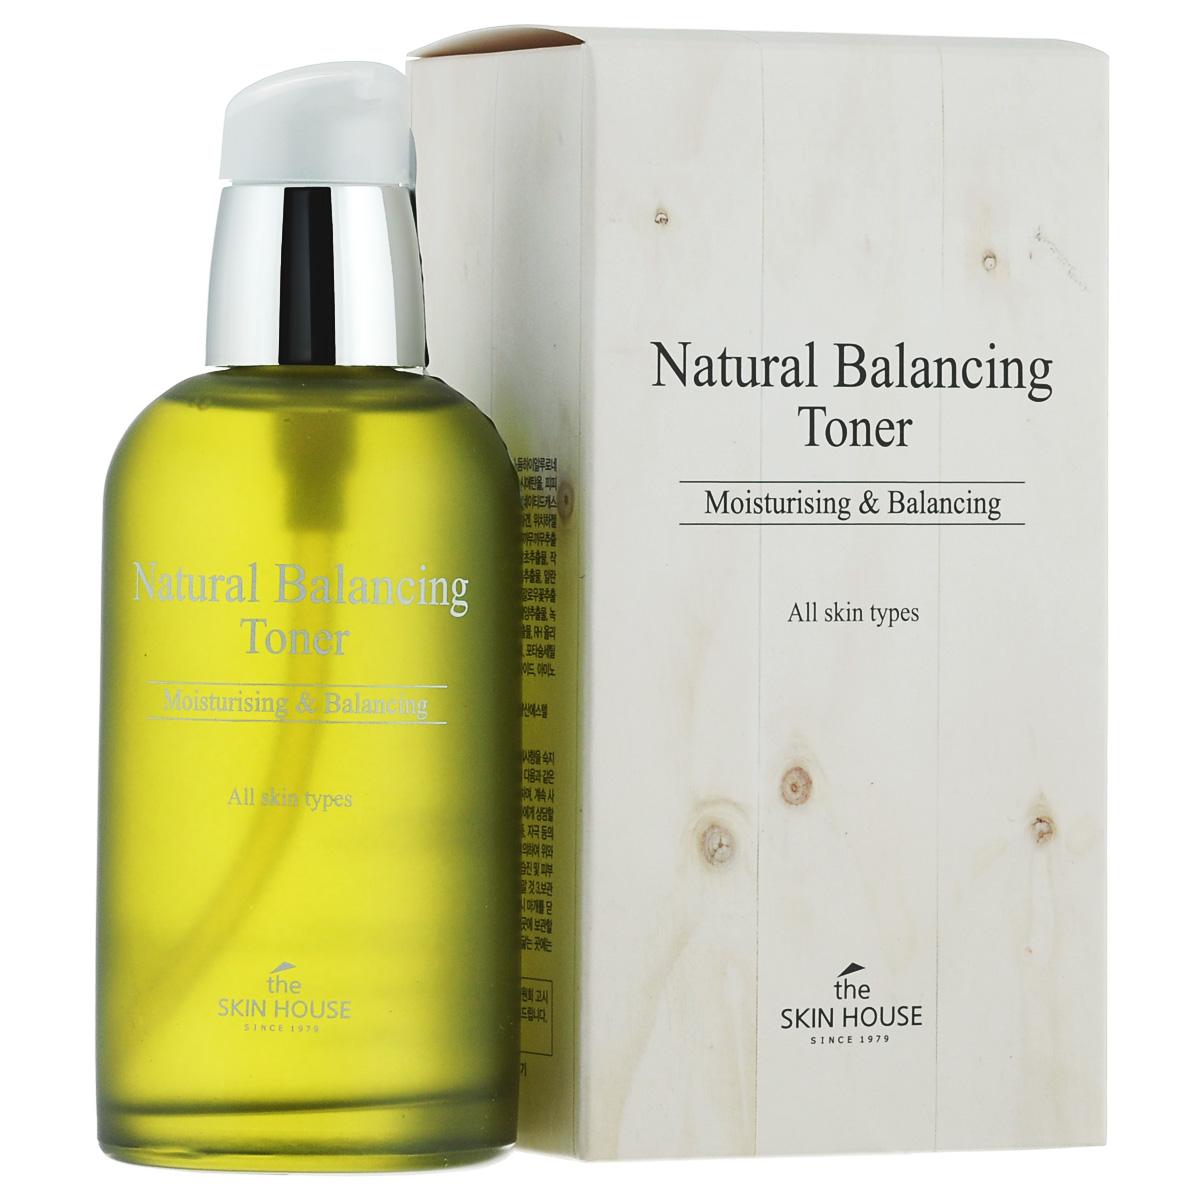 The Skin House Балансирующий тоник Natural balancing, 130 мл